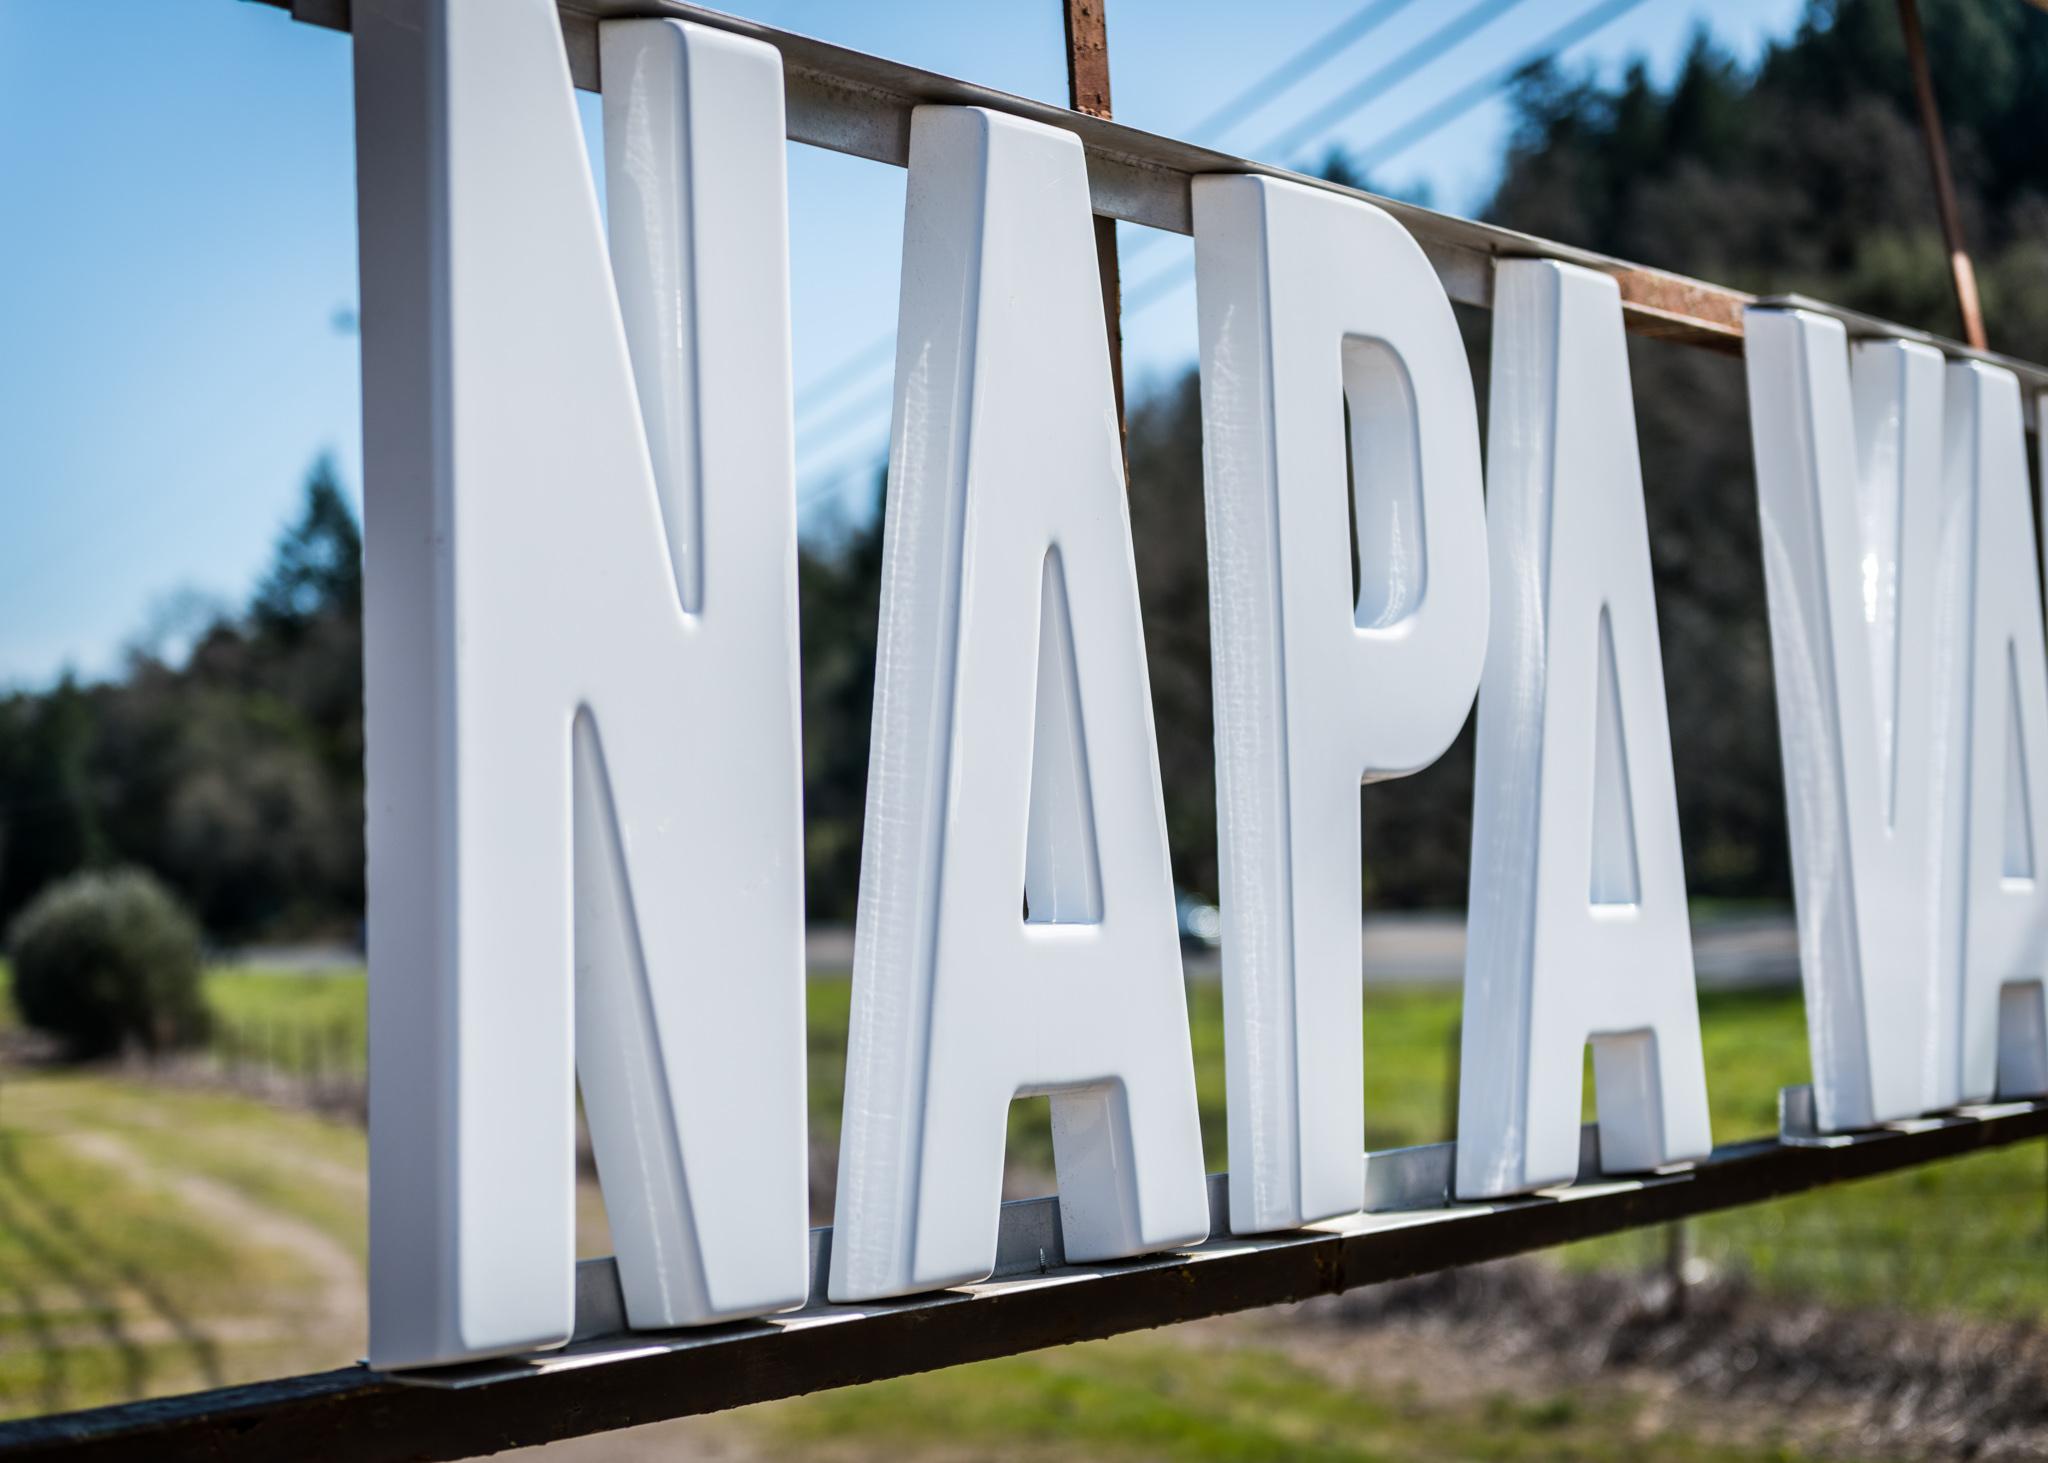 California : Napa Valley : North end of the Napa Valley